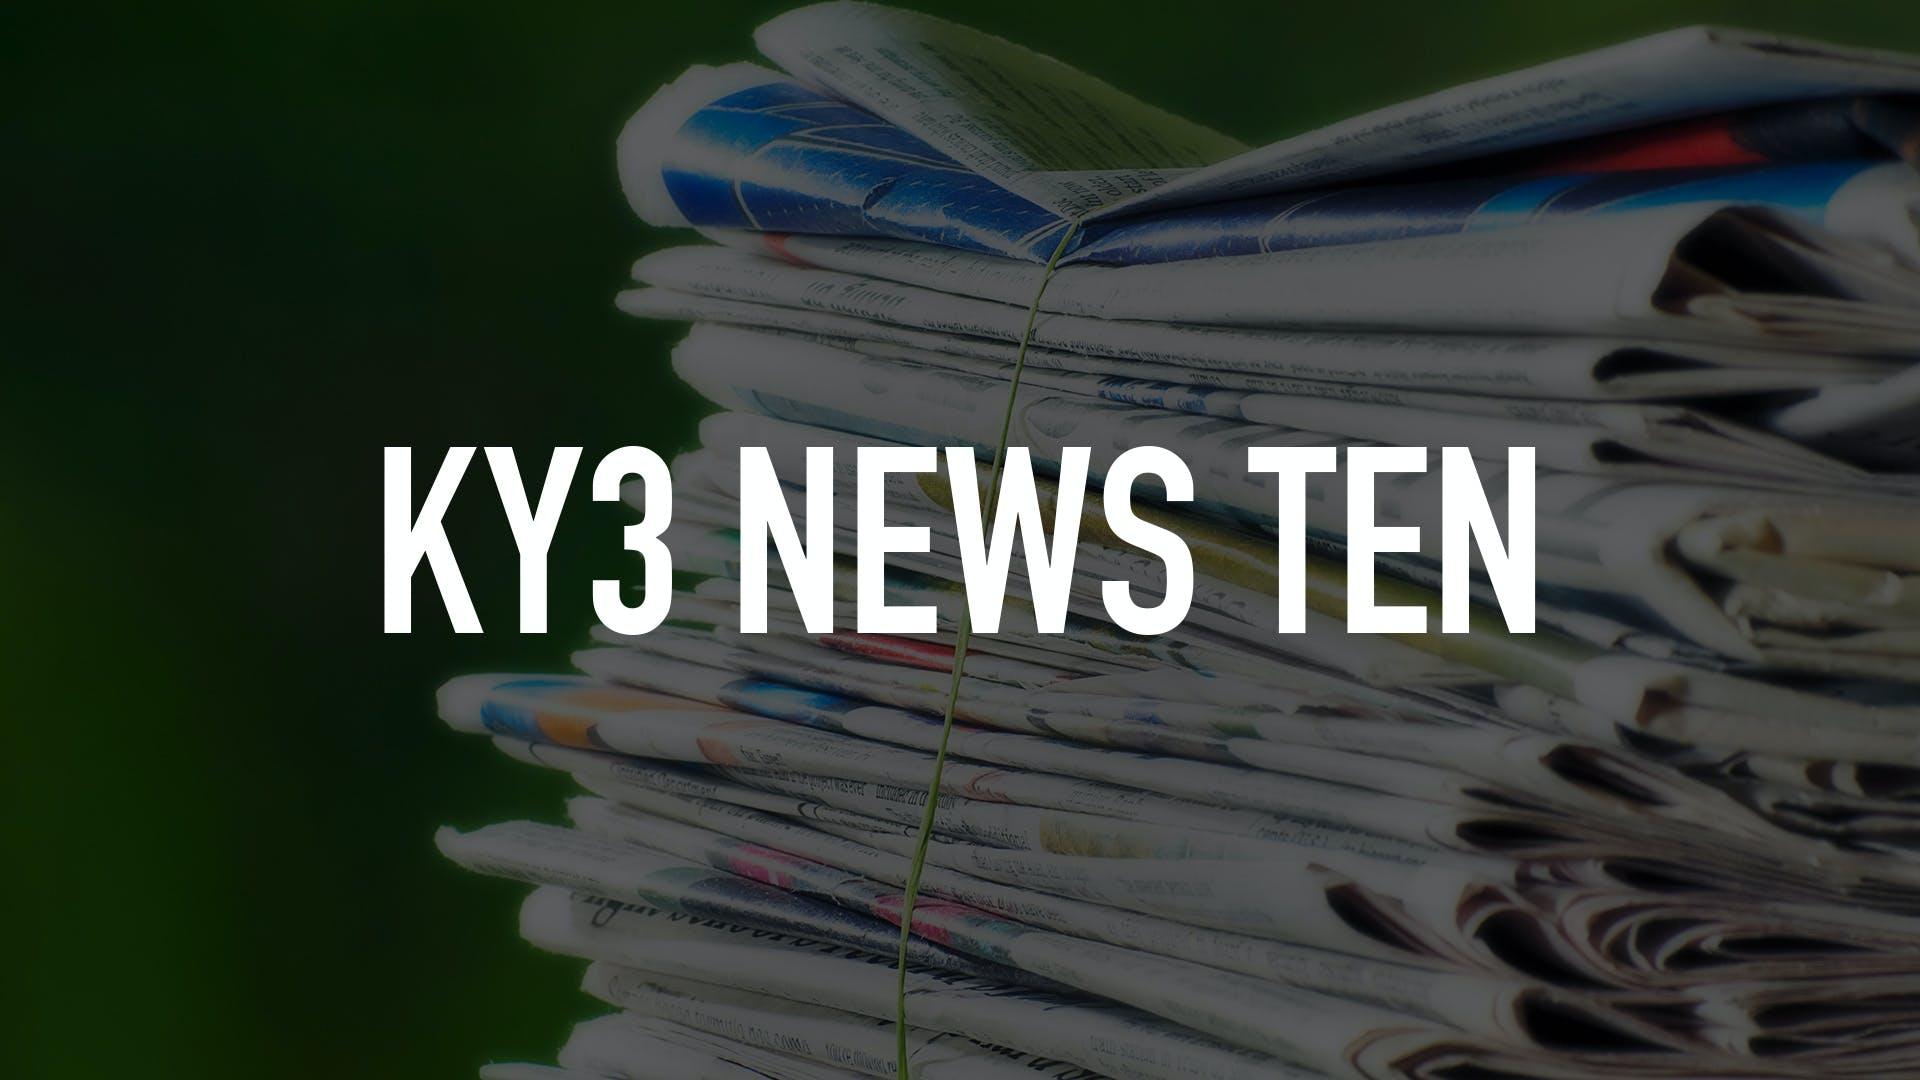 Watch KY3 News Ten | Stream on fuboTV (Free Trial)